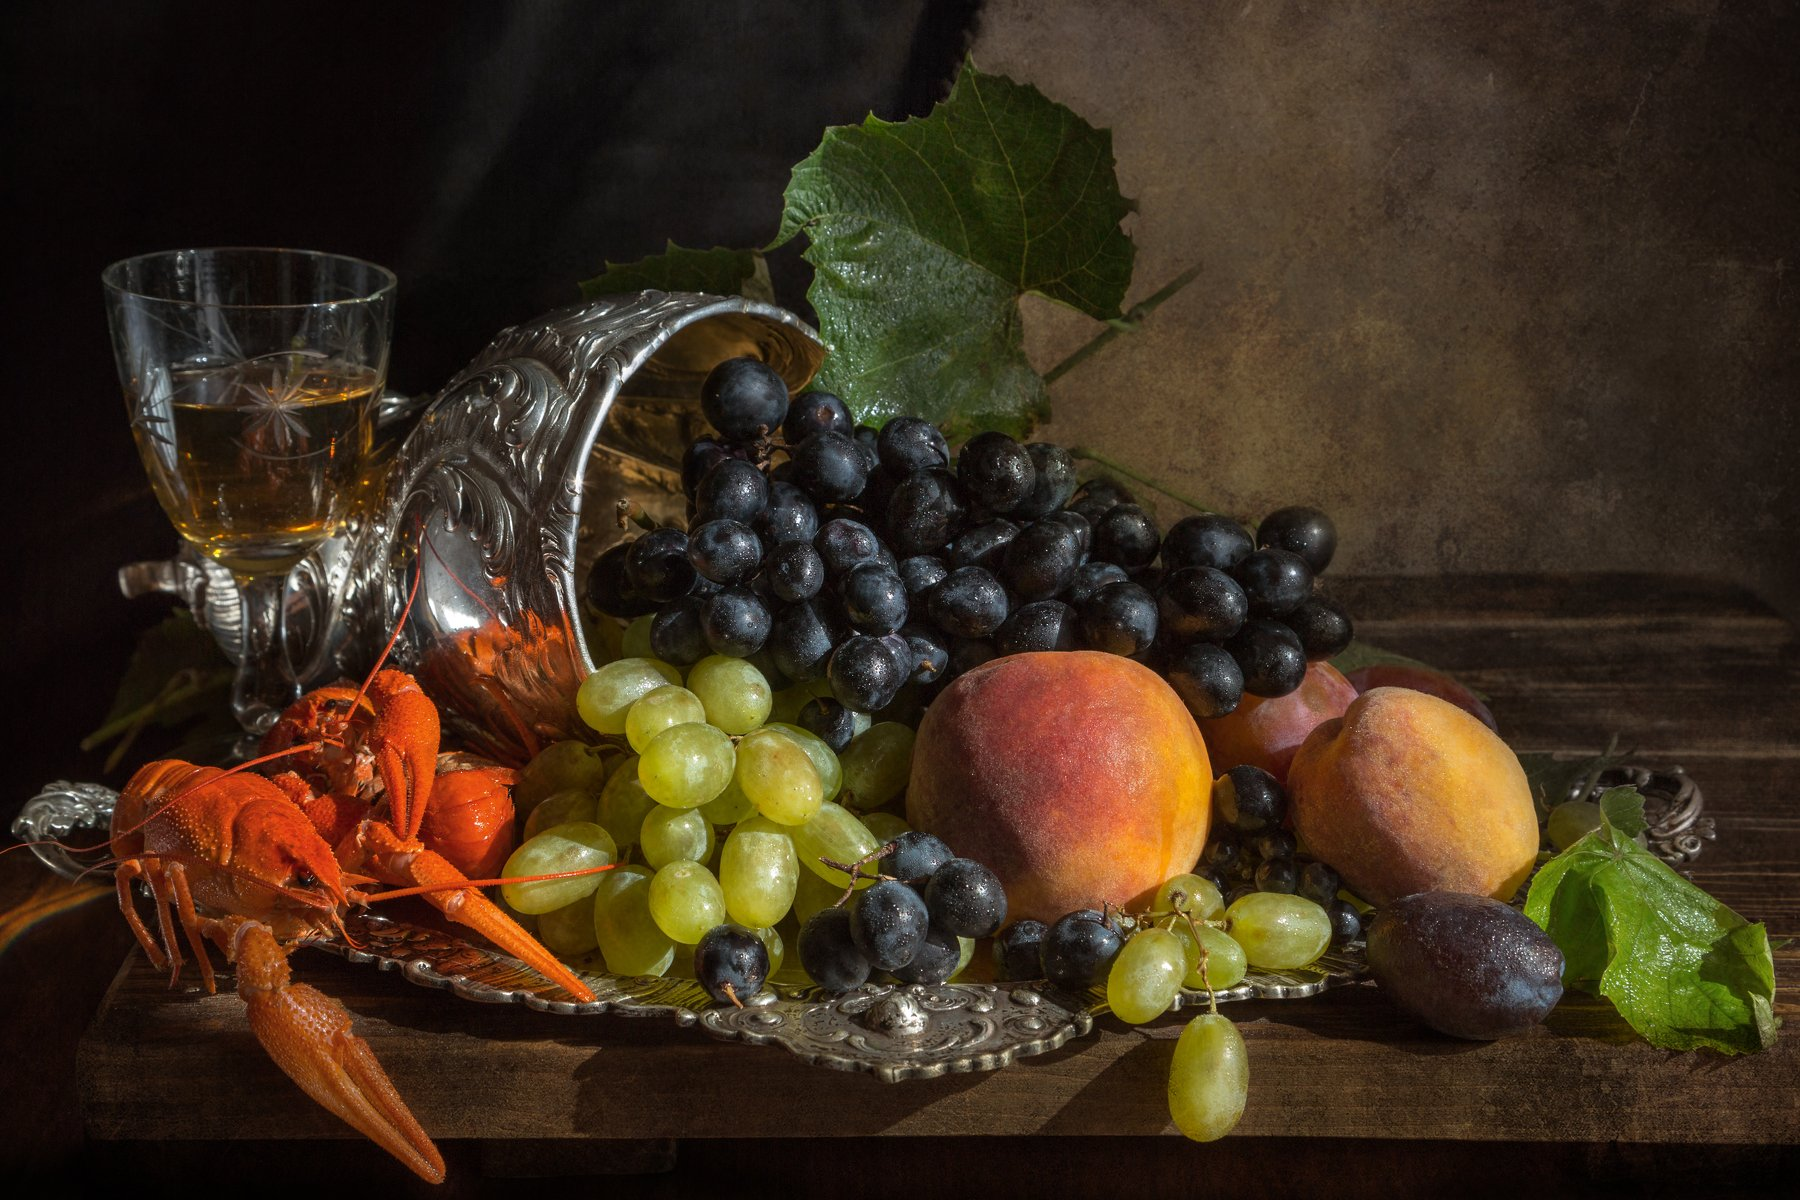 фото , цвет , натюрморт ,  фрукты , персик , виноград  , поднос , раки , ваза , серебро, Федотов Вадим(Vadius)